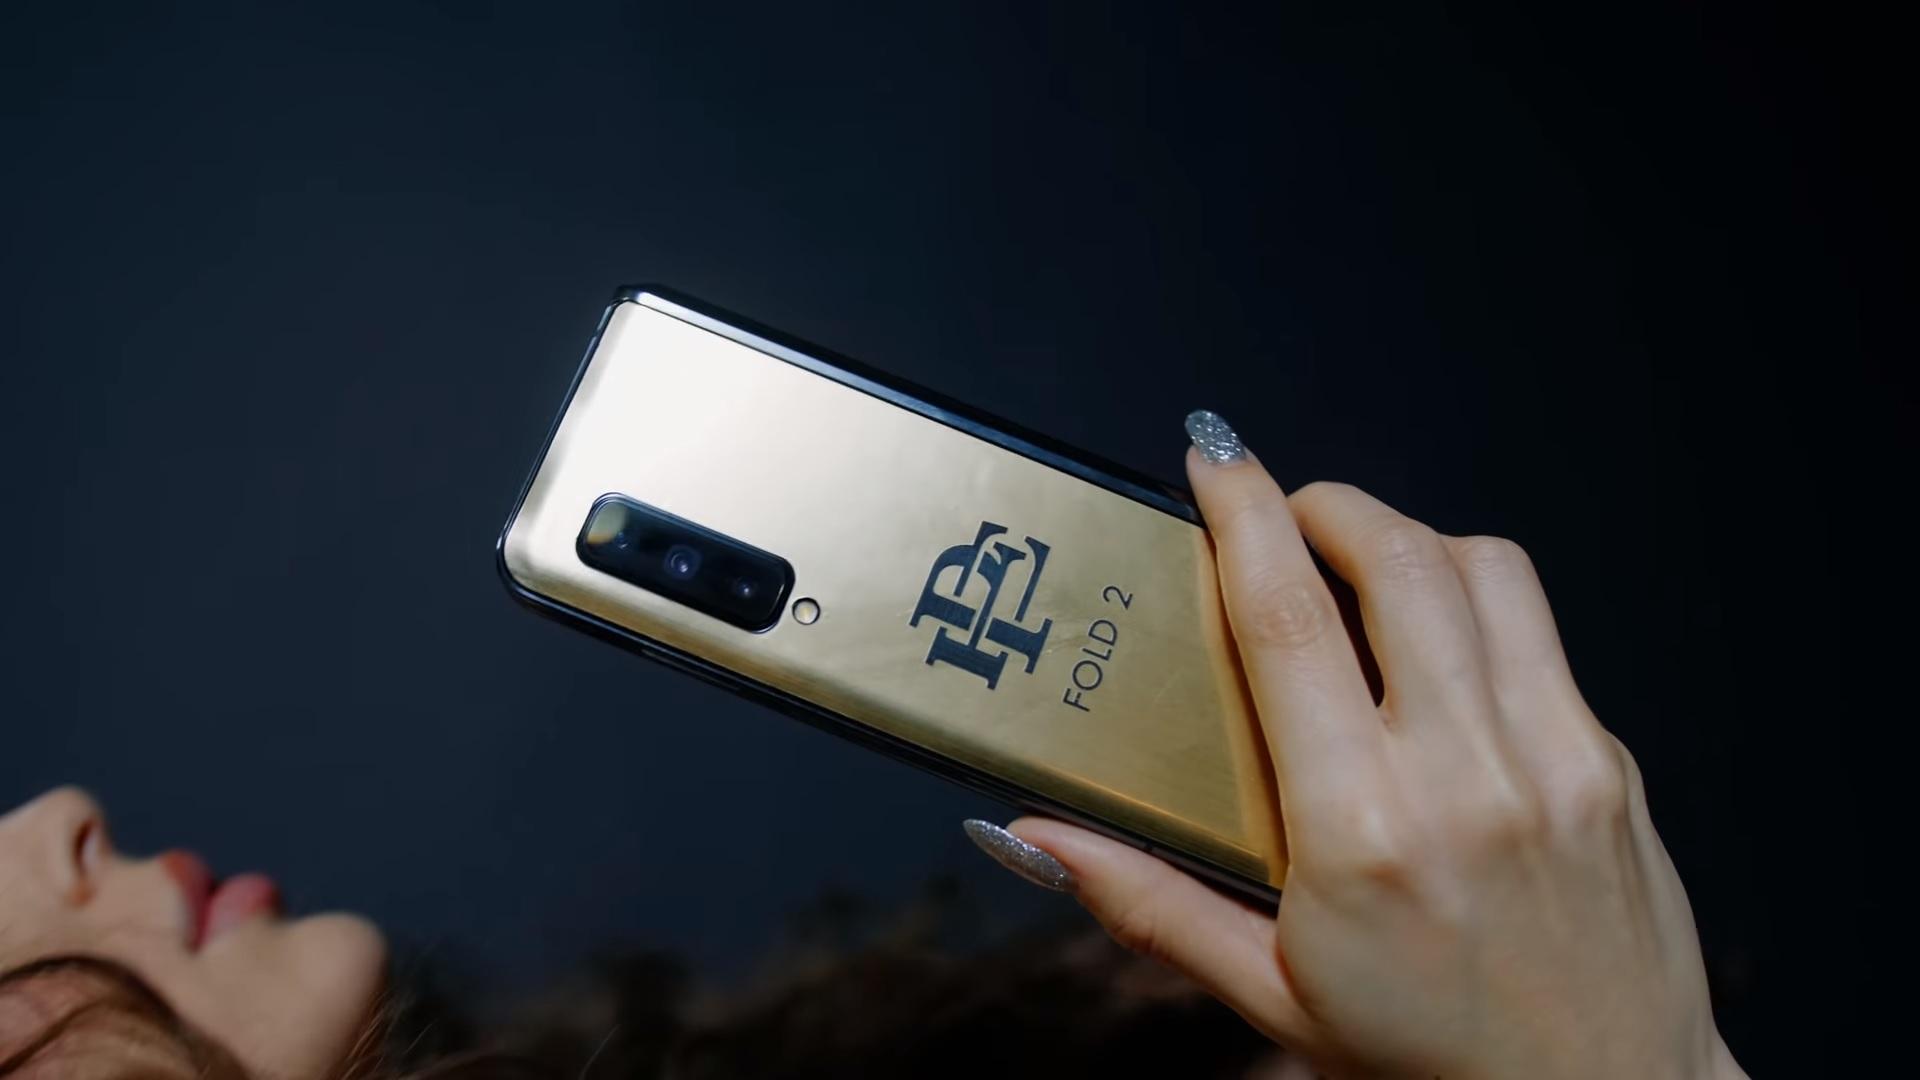 składany smartfon Escobar Fold 2